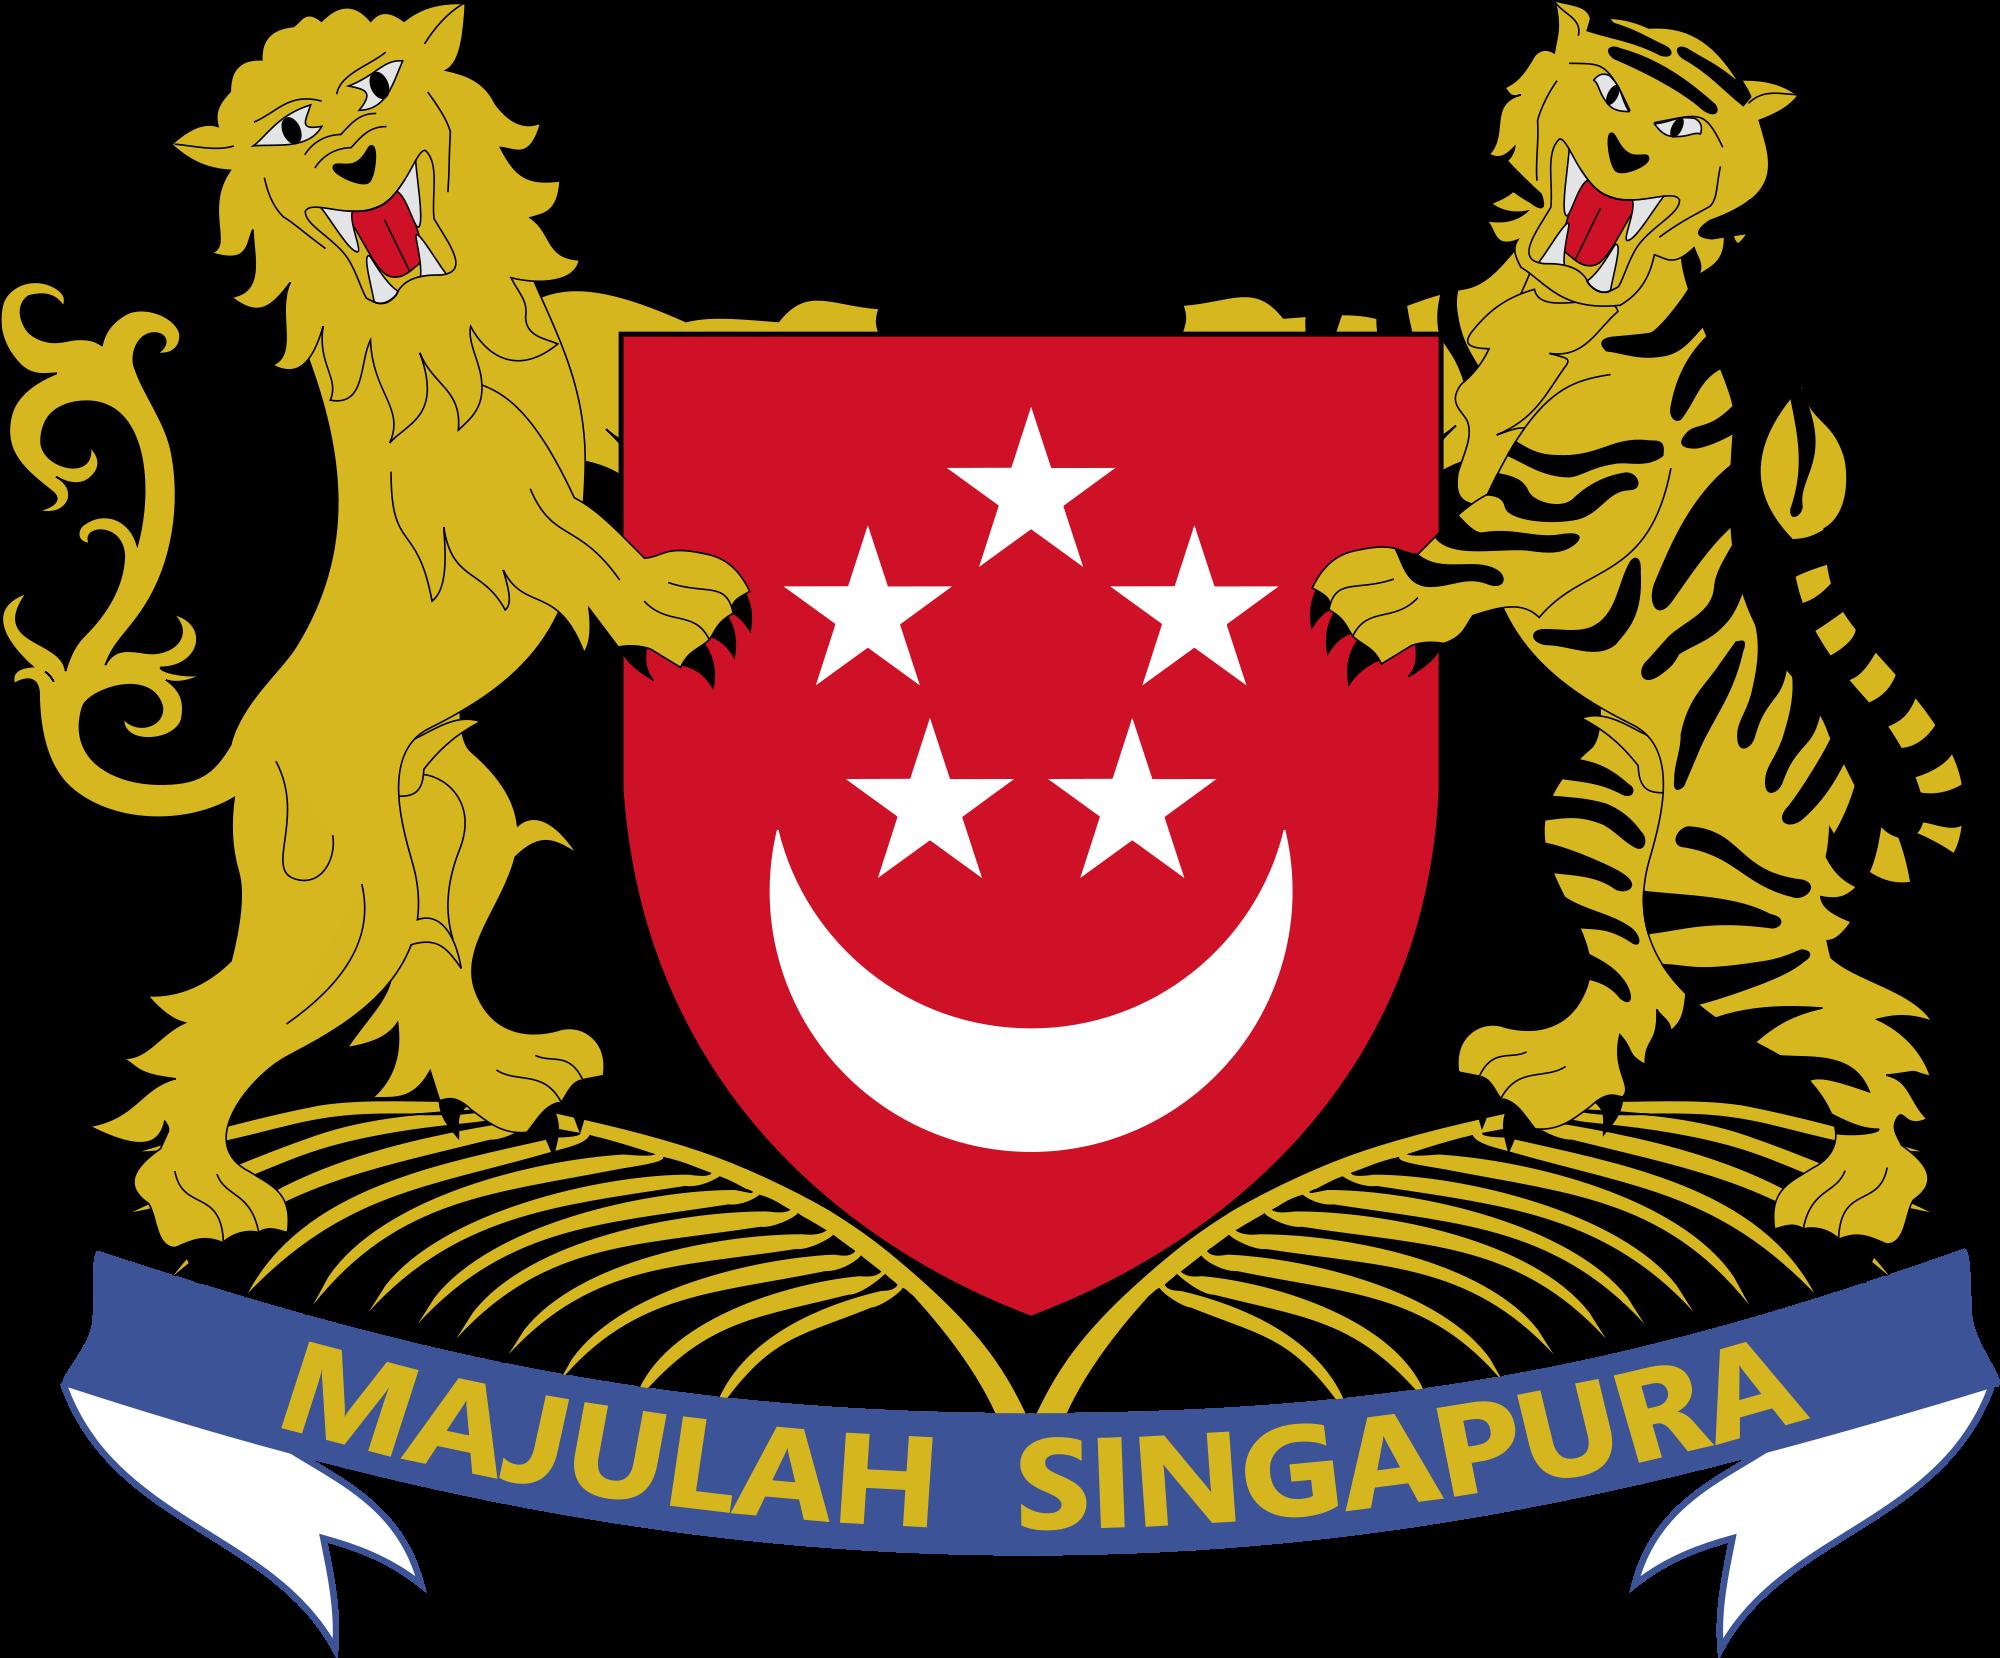 Singaporen vaakuna